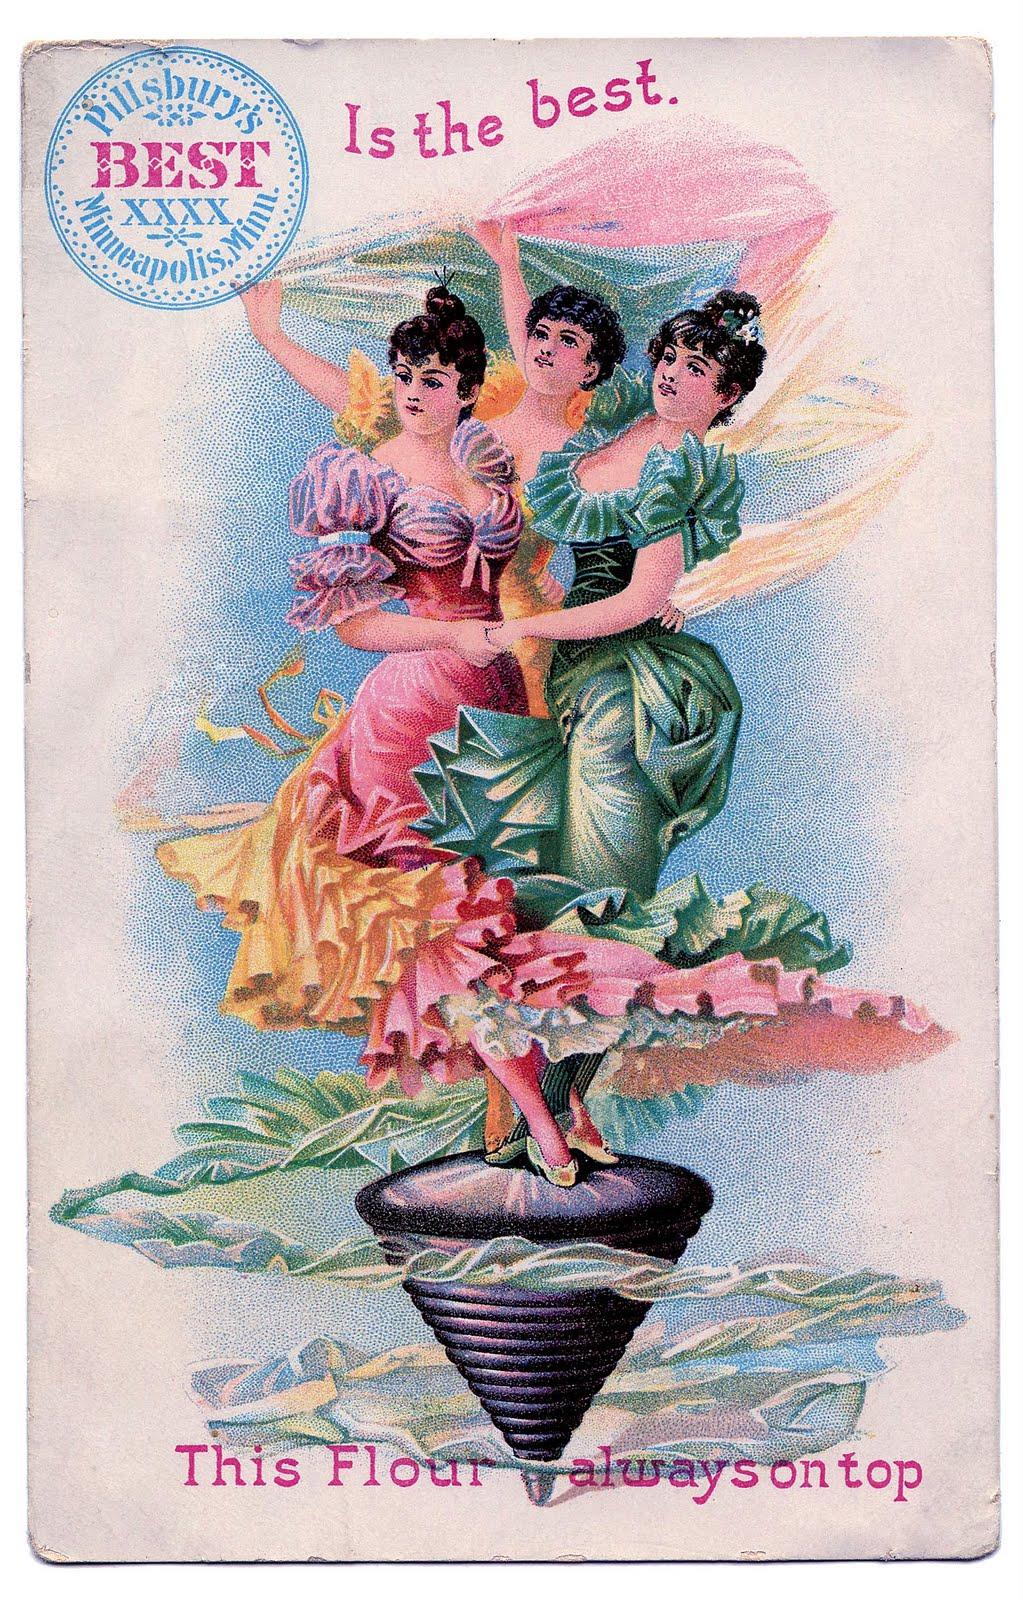 Vintage Graphic Dancing Ladies Advertising The